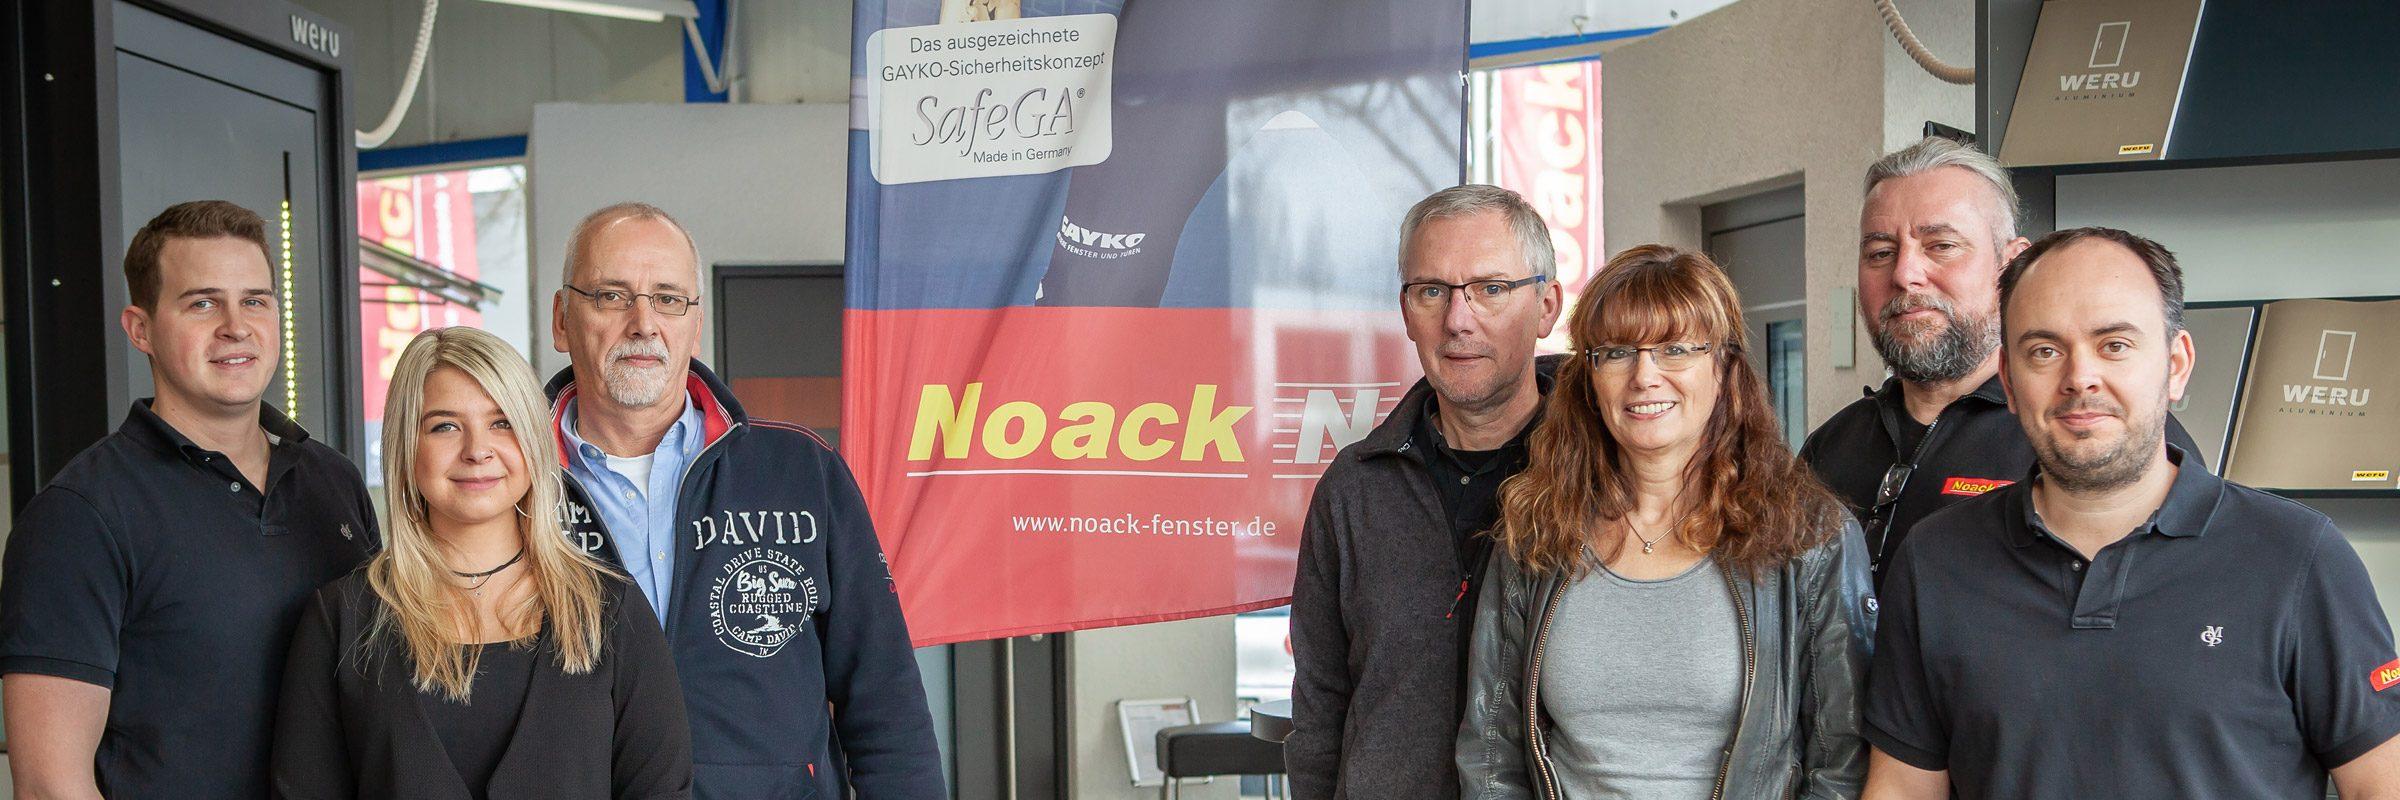 Team Noack